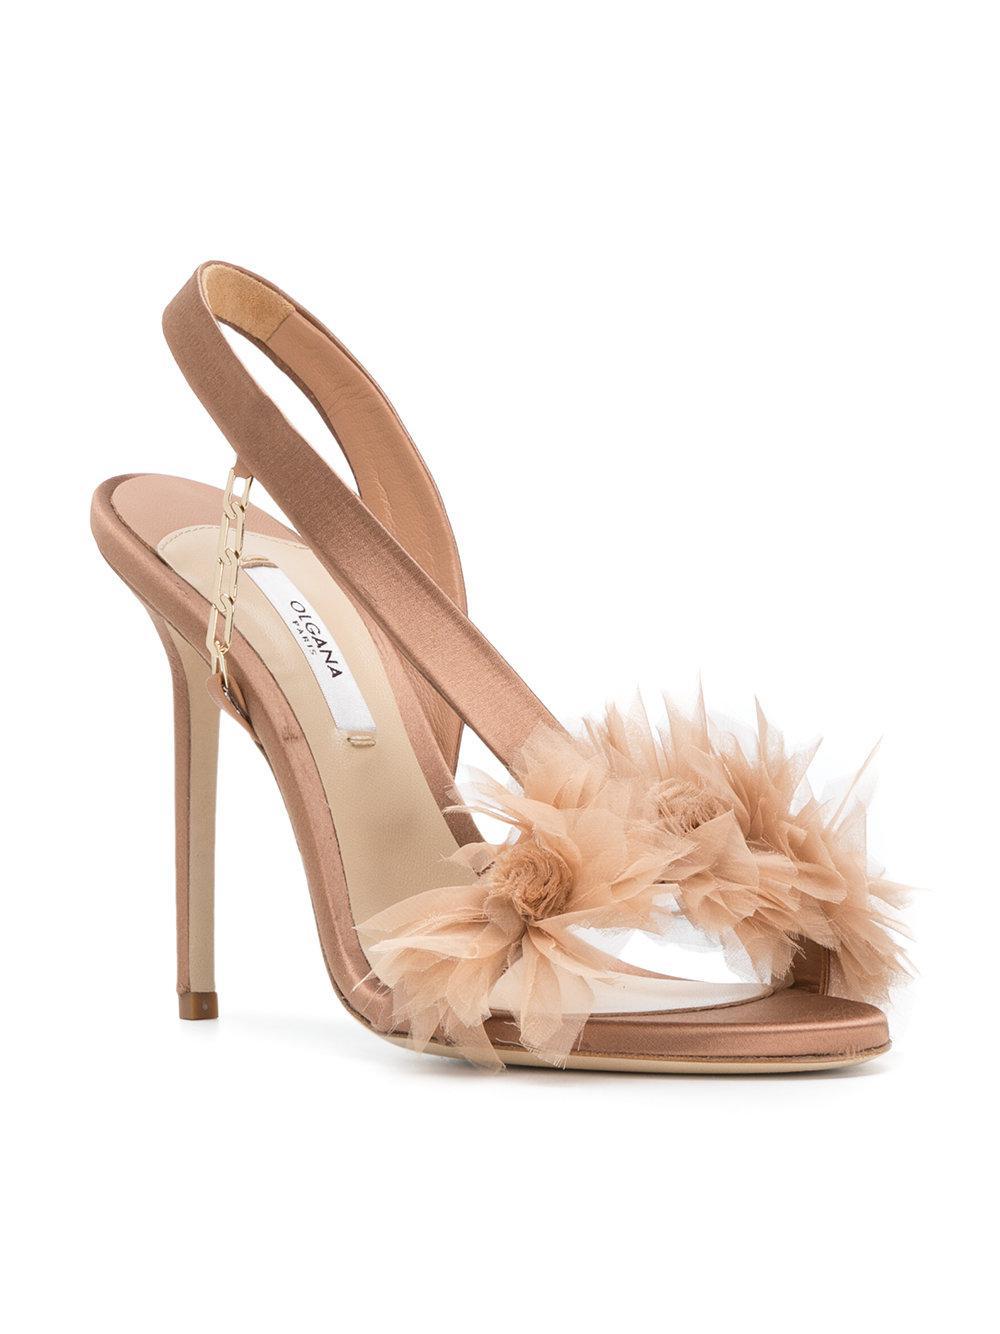 Pre-owned - Leather sandals Olgana Paris j3AQLj